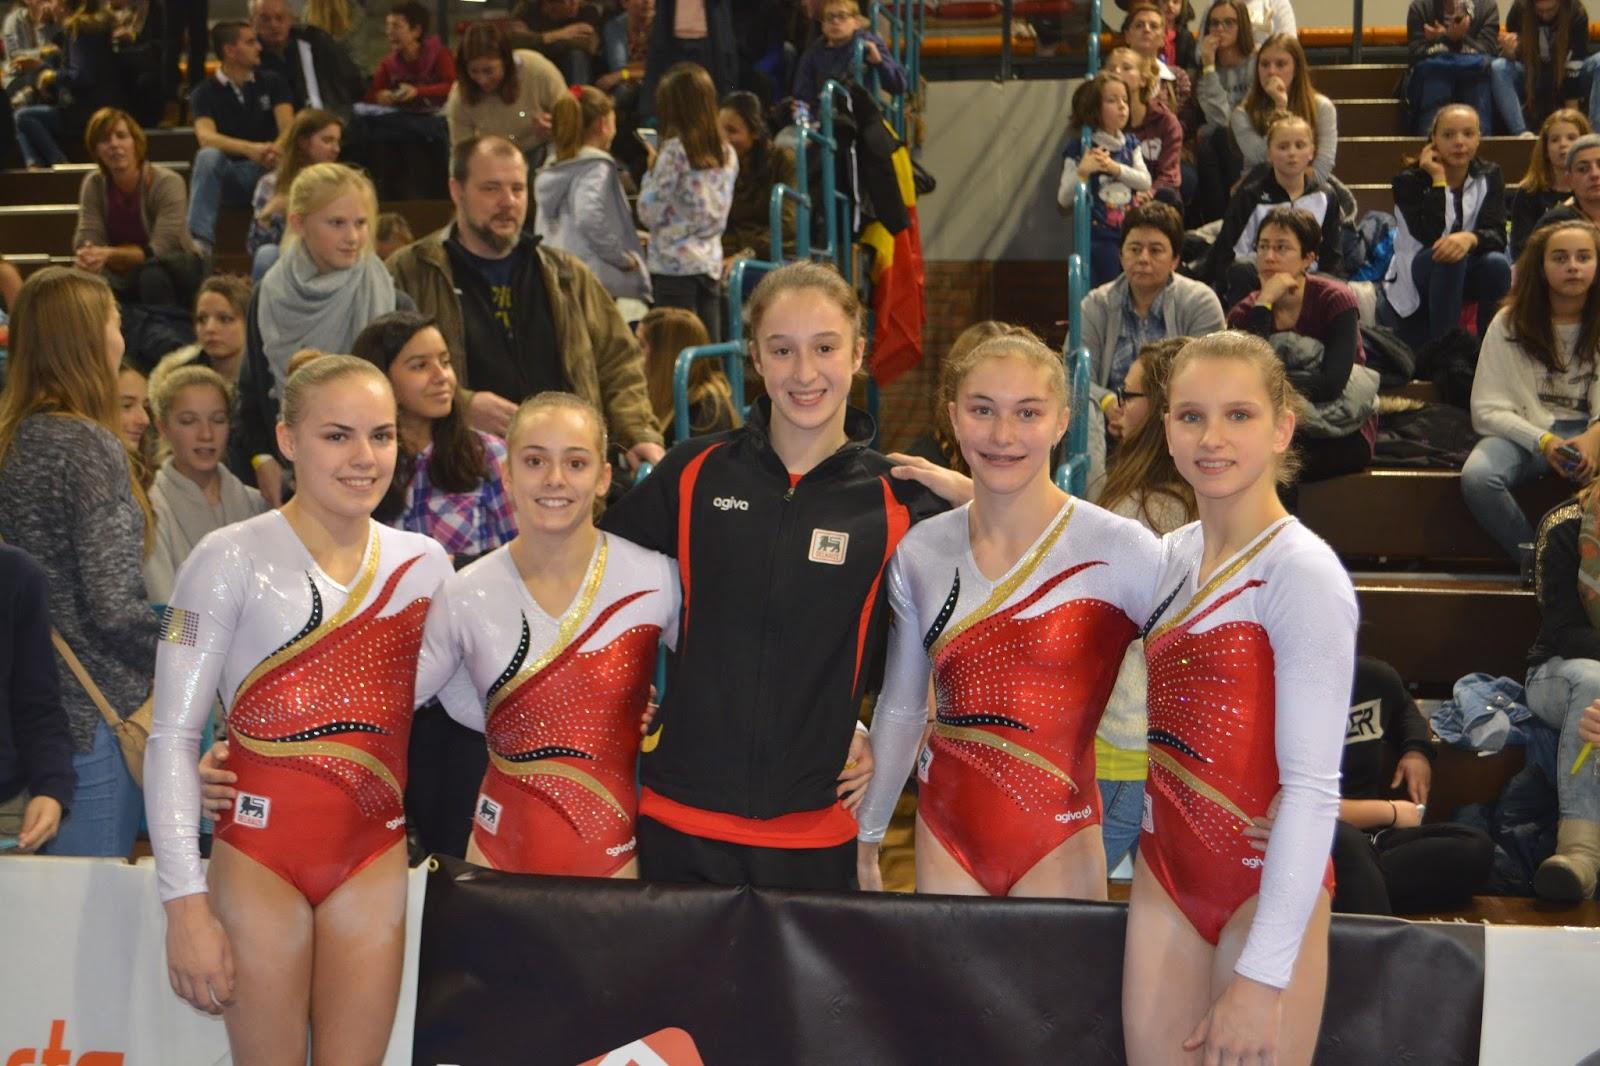 Belgian Gymnastics Top Gym 2015 Gold For Axelle Klinckaert